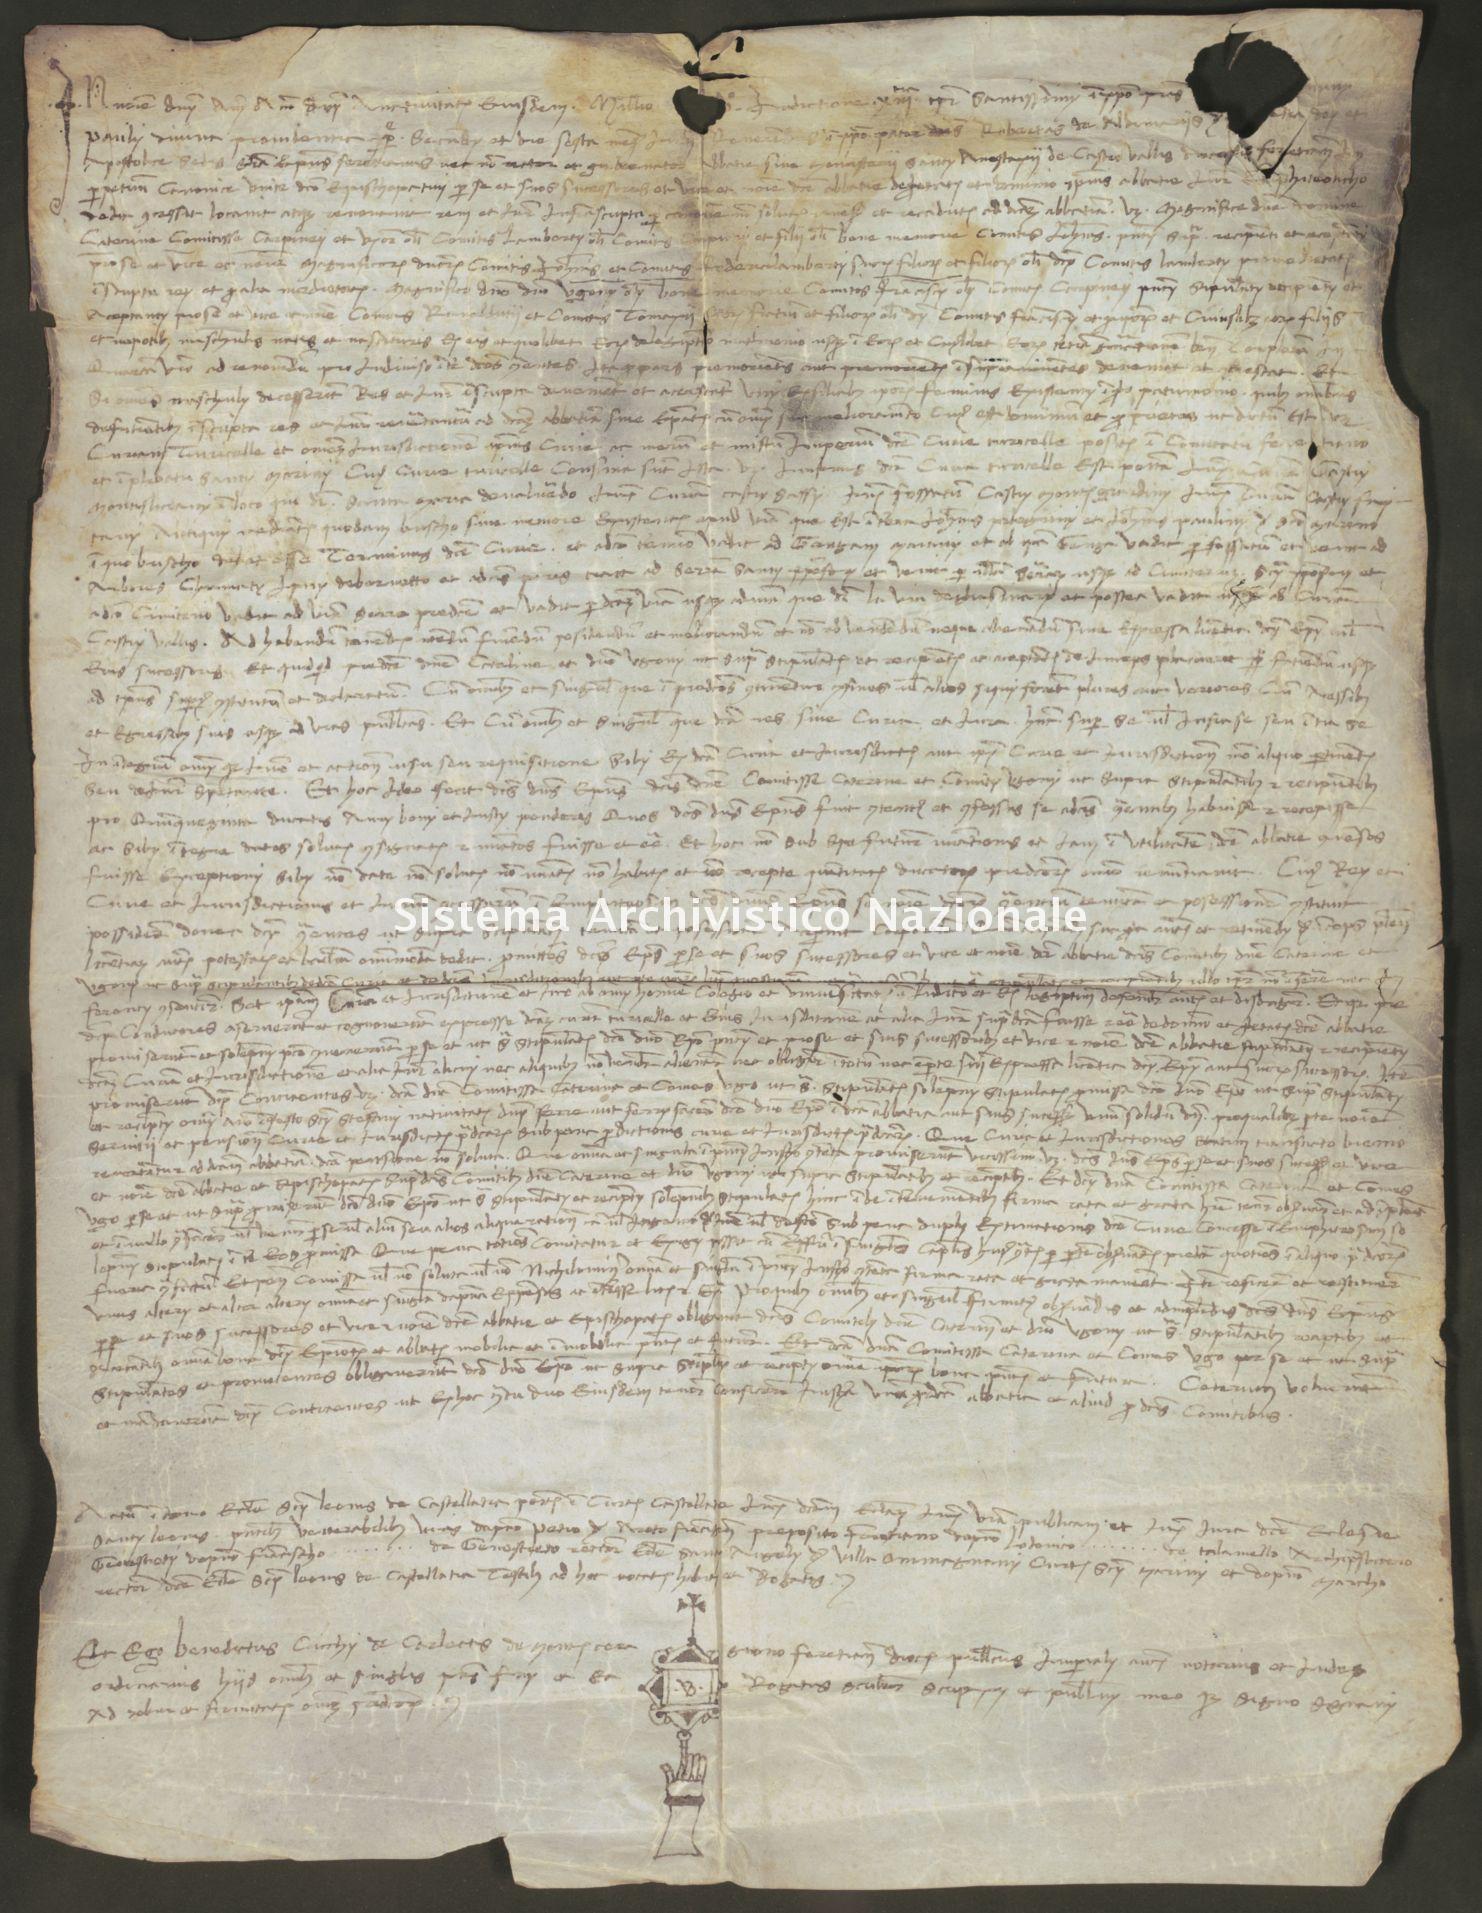 036. Carpegna Falconieri Gabrielli, Scavolino, pergamena n. 36r